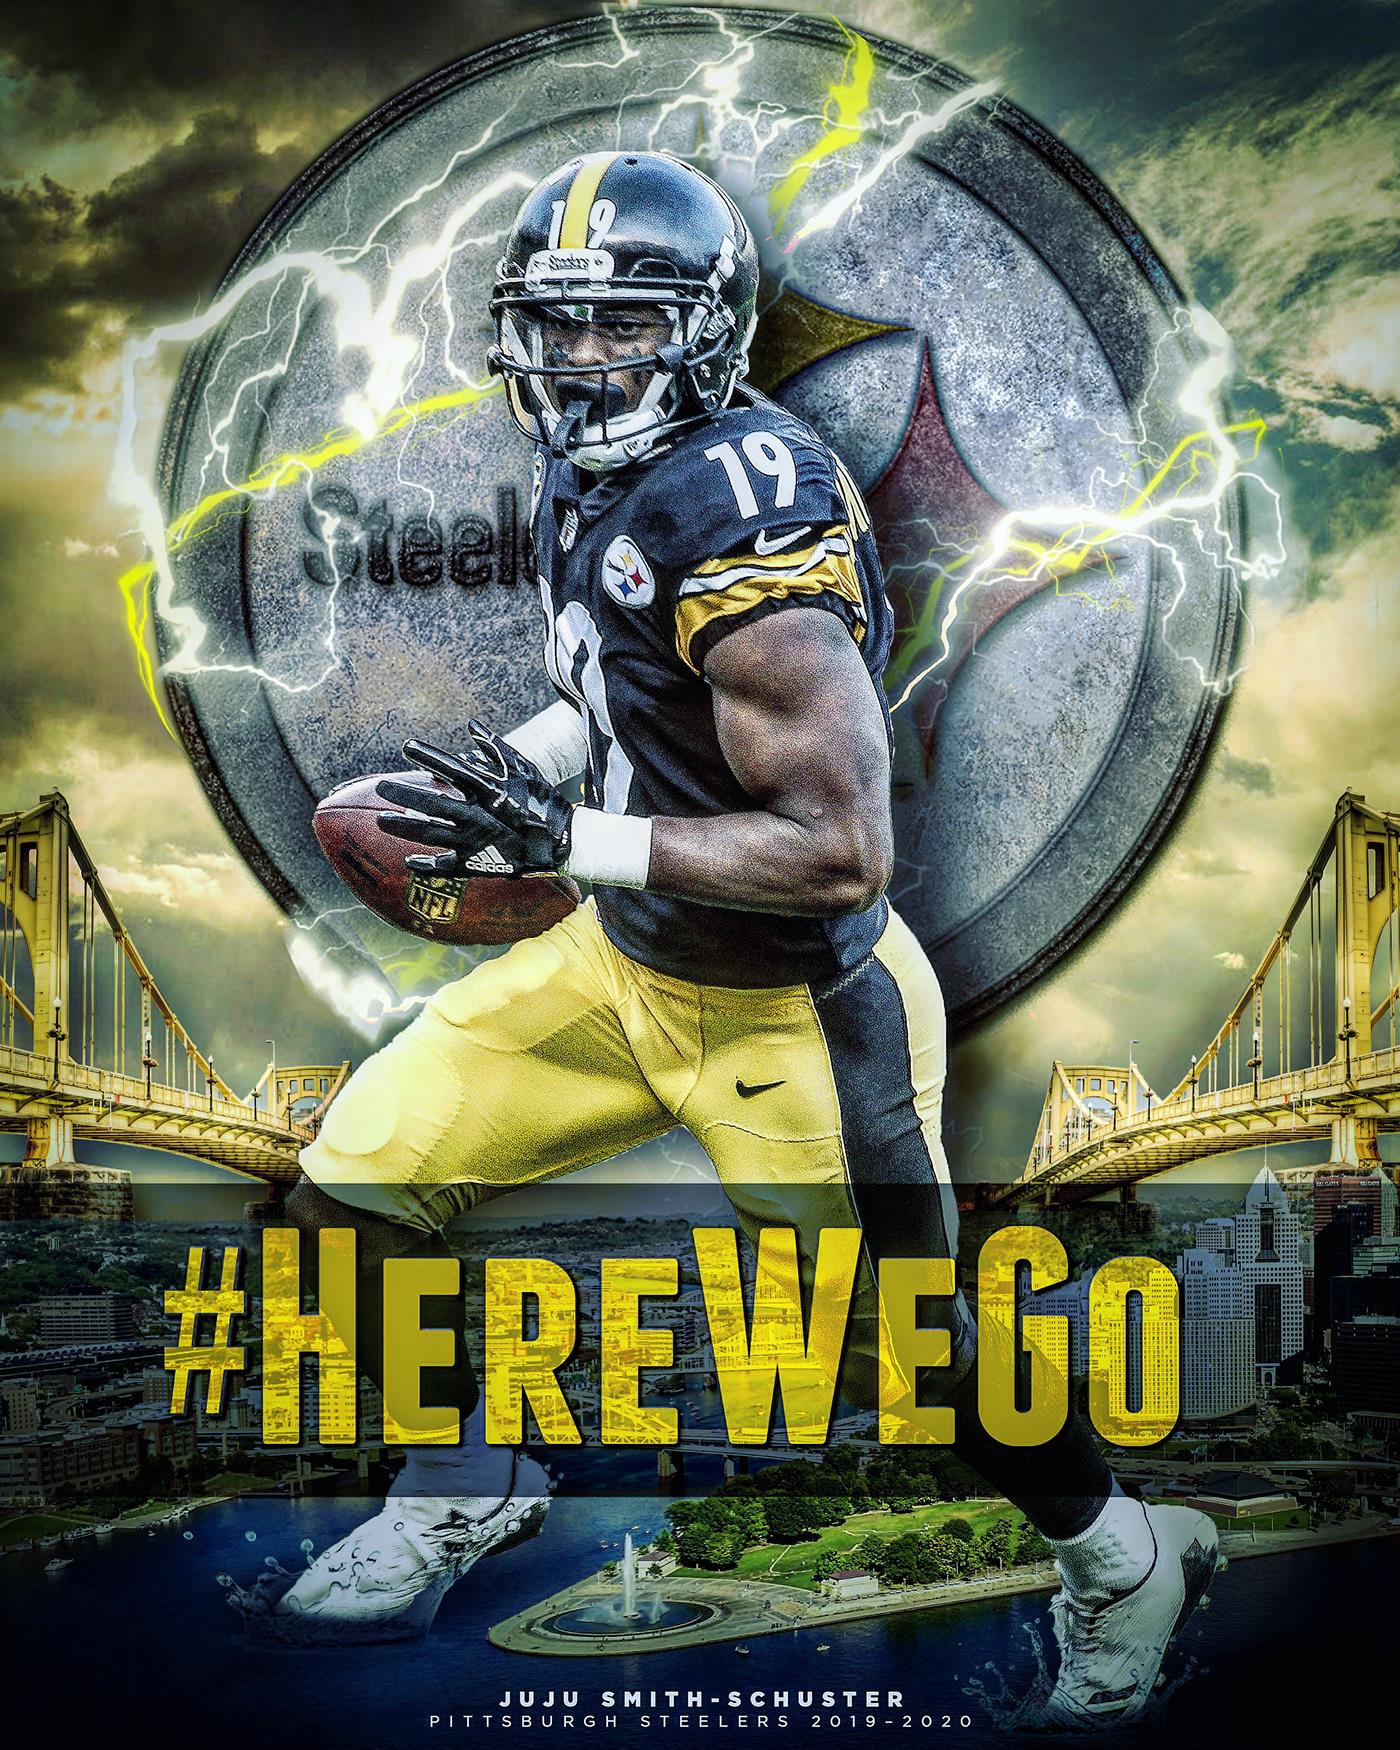 Pittsburgh steelers nfl football bridges Photo Composite juju